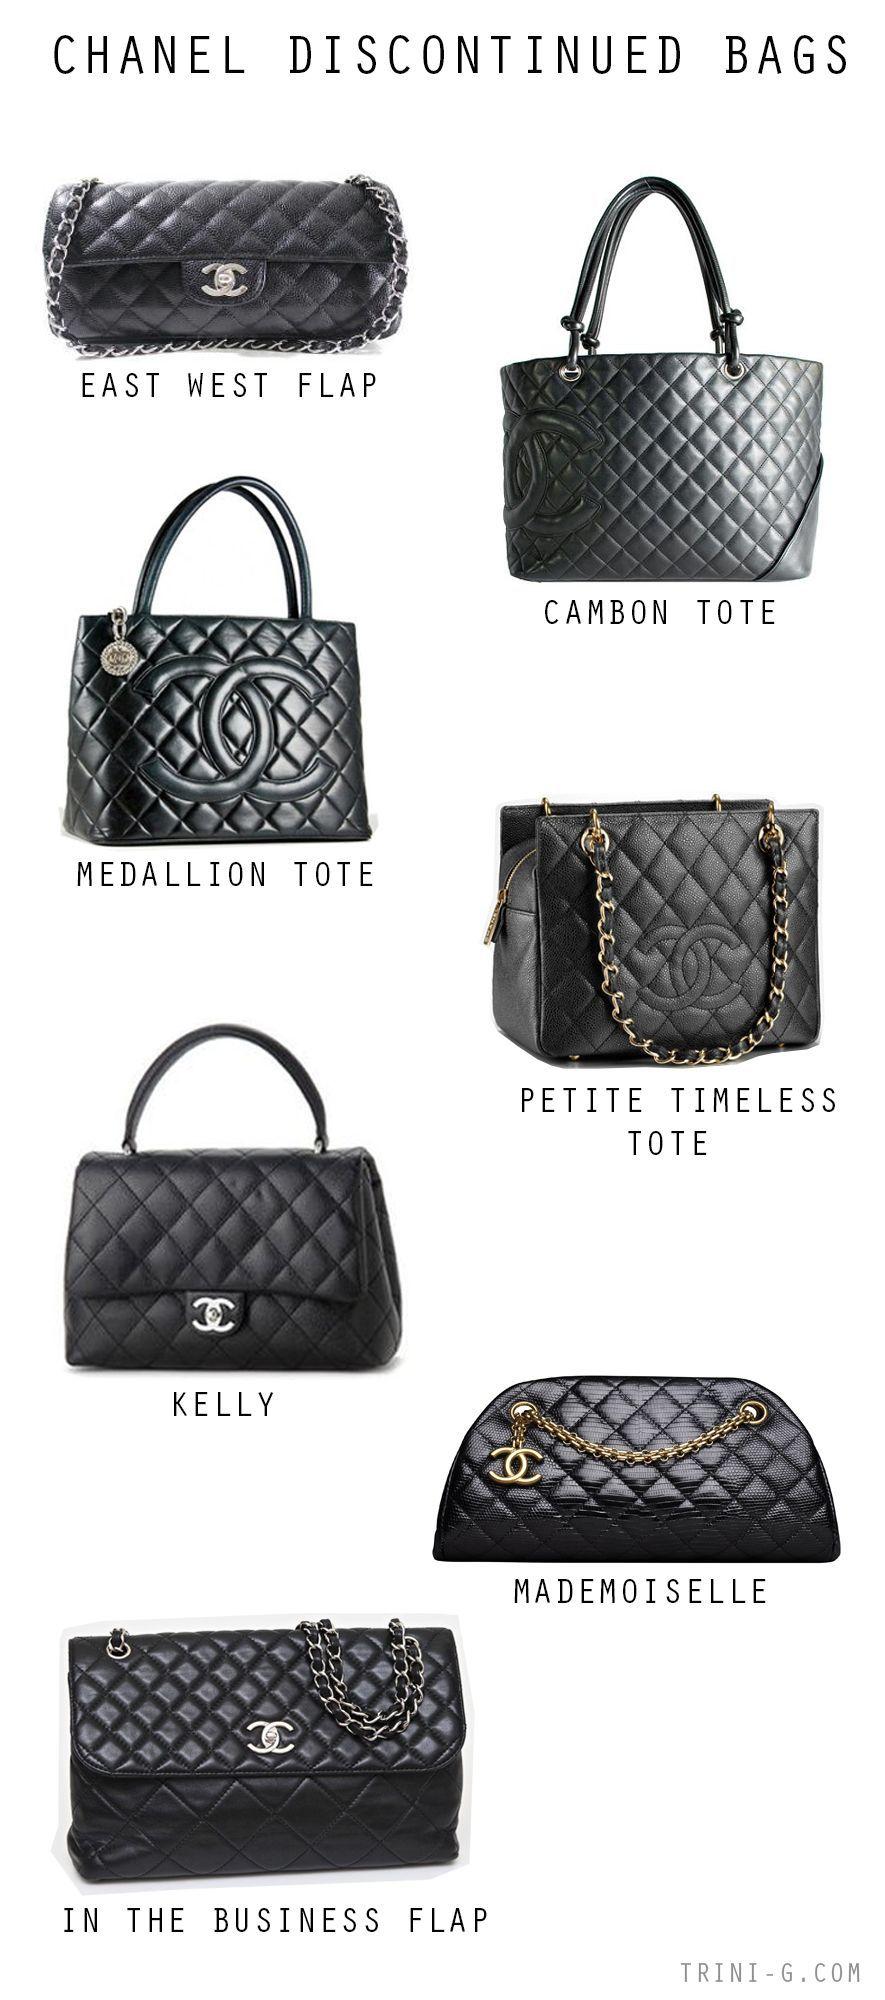 Trini blog  Chanel discontinued bags   Chanel handbags in 2018 ... 52fa1c3aa5